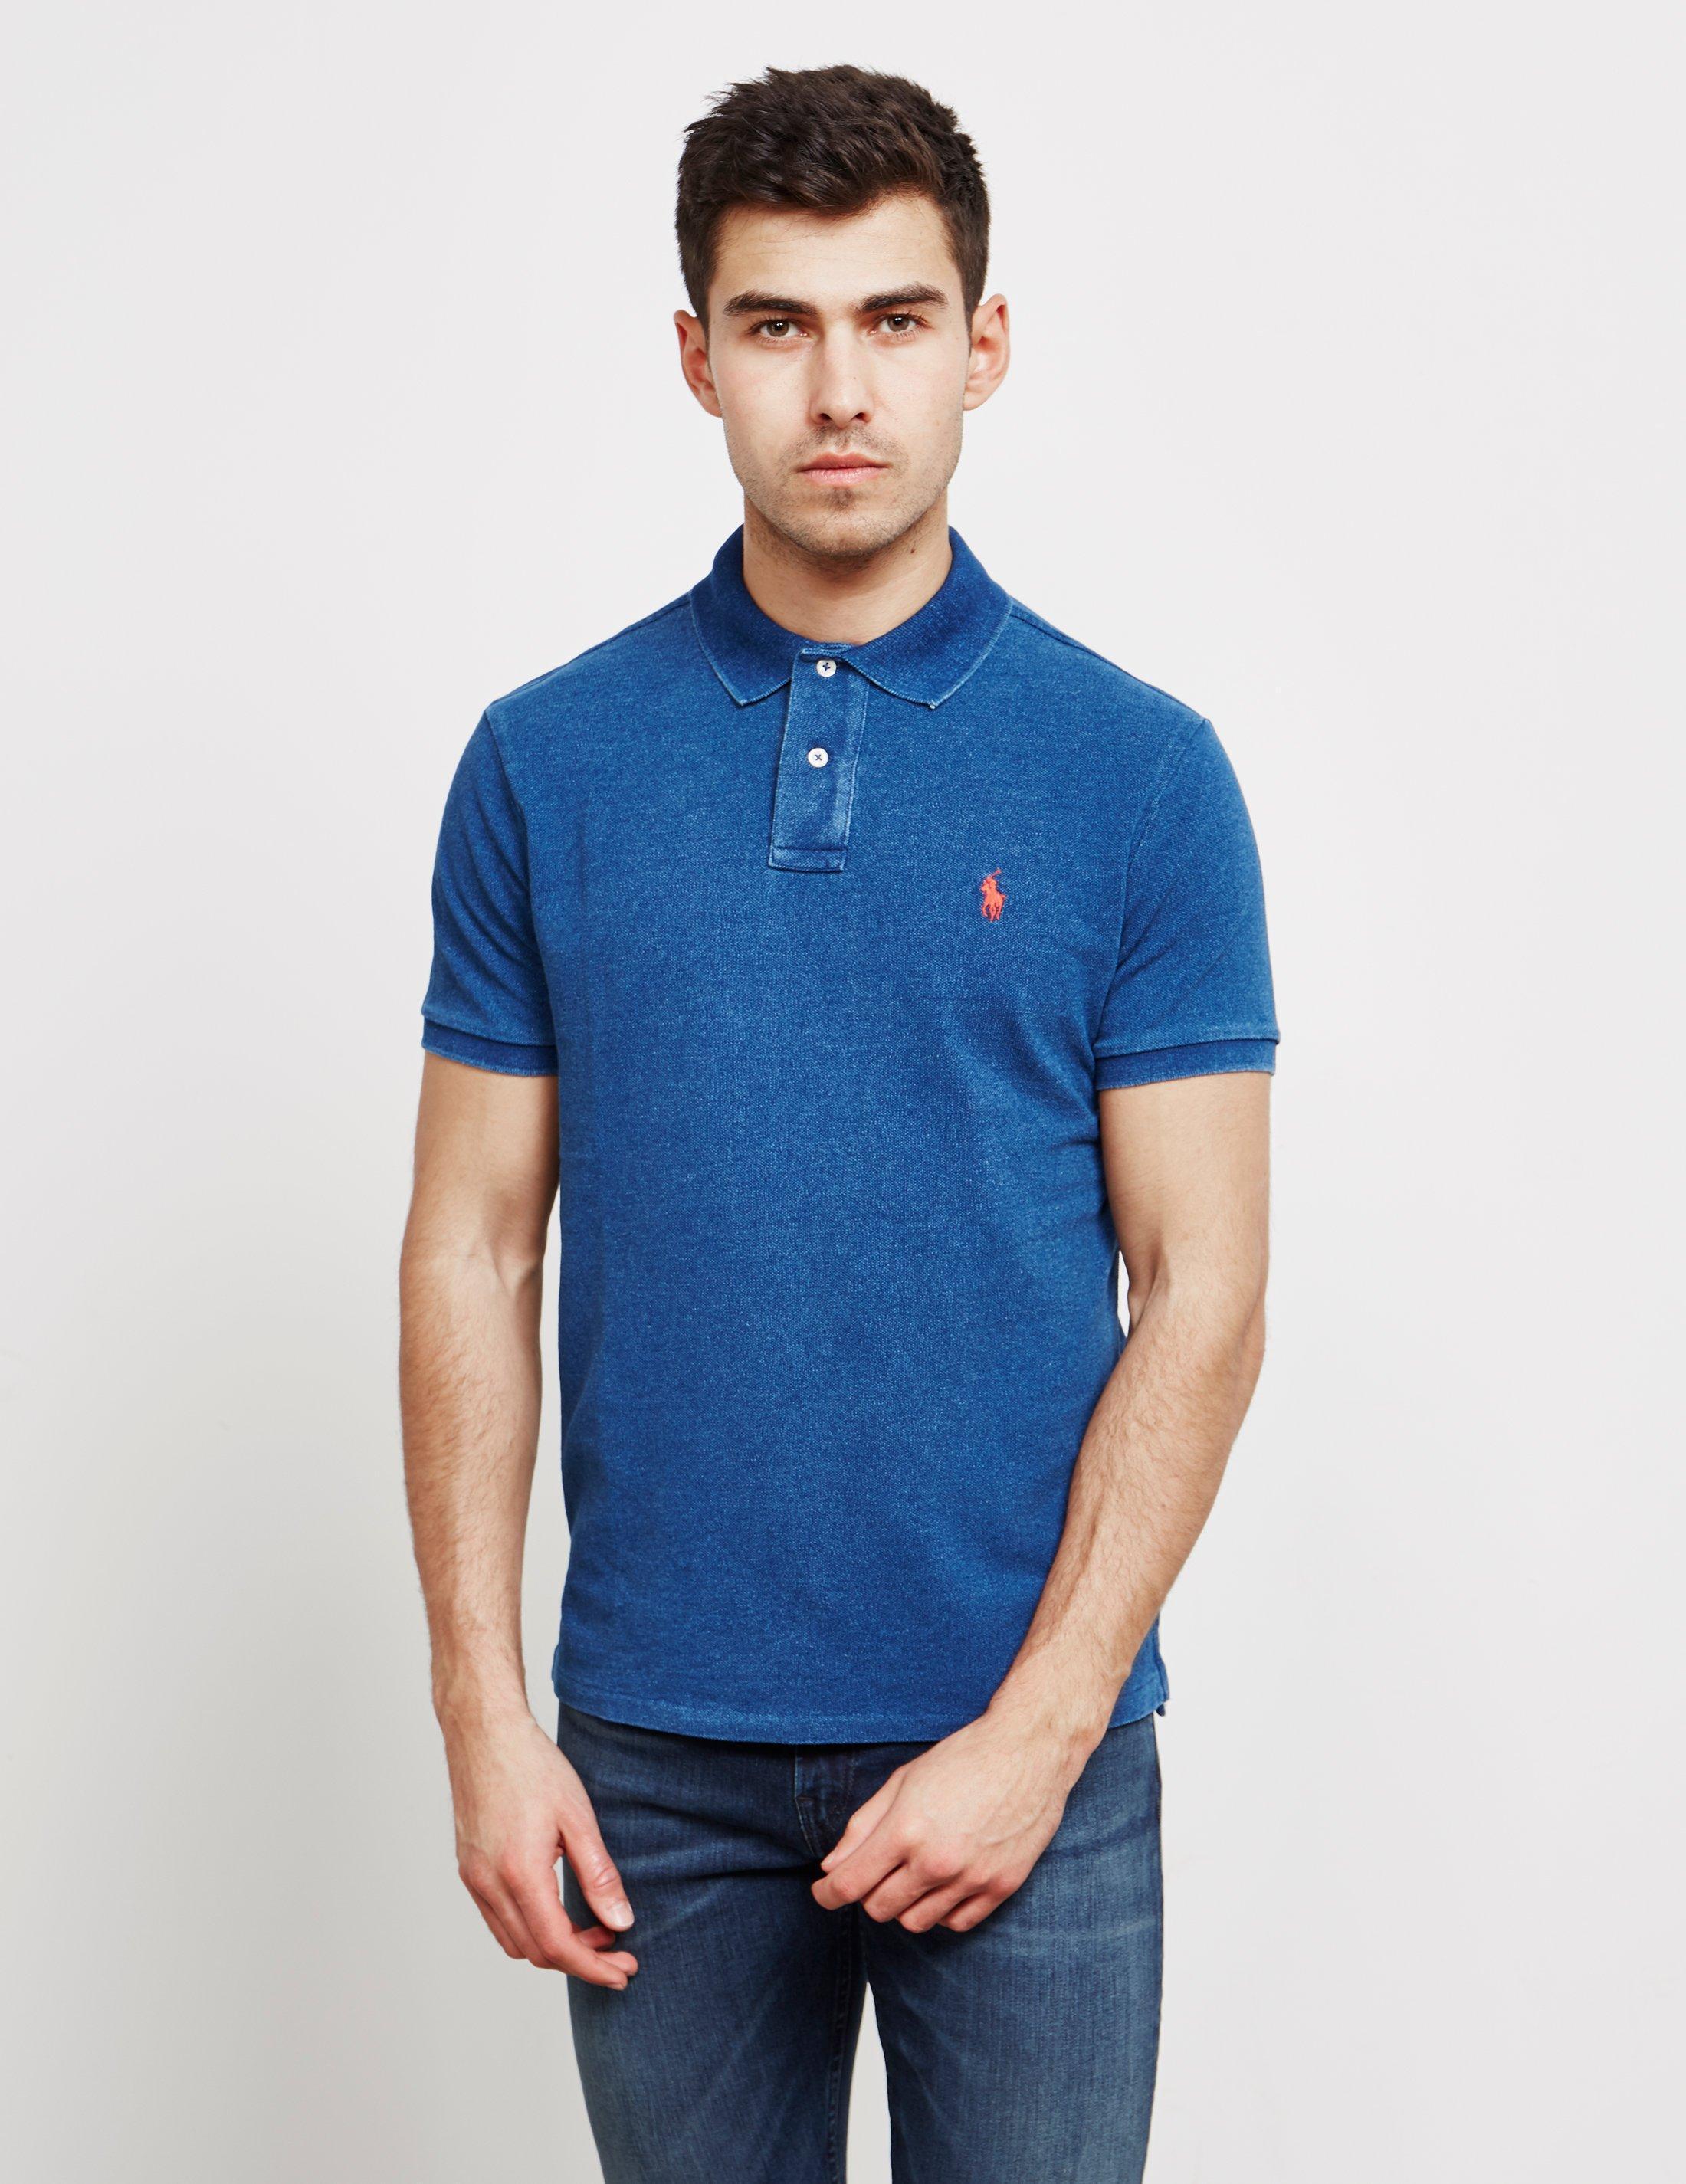 26e979598e9 Lyst - Polo Ralph Lauren Mens Mesh Short Sleeve Polo Shirt Blue in ...